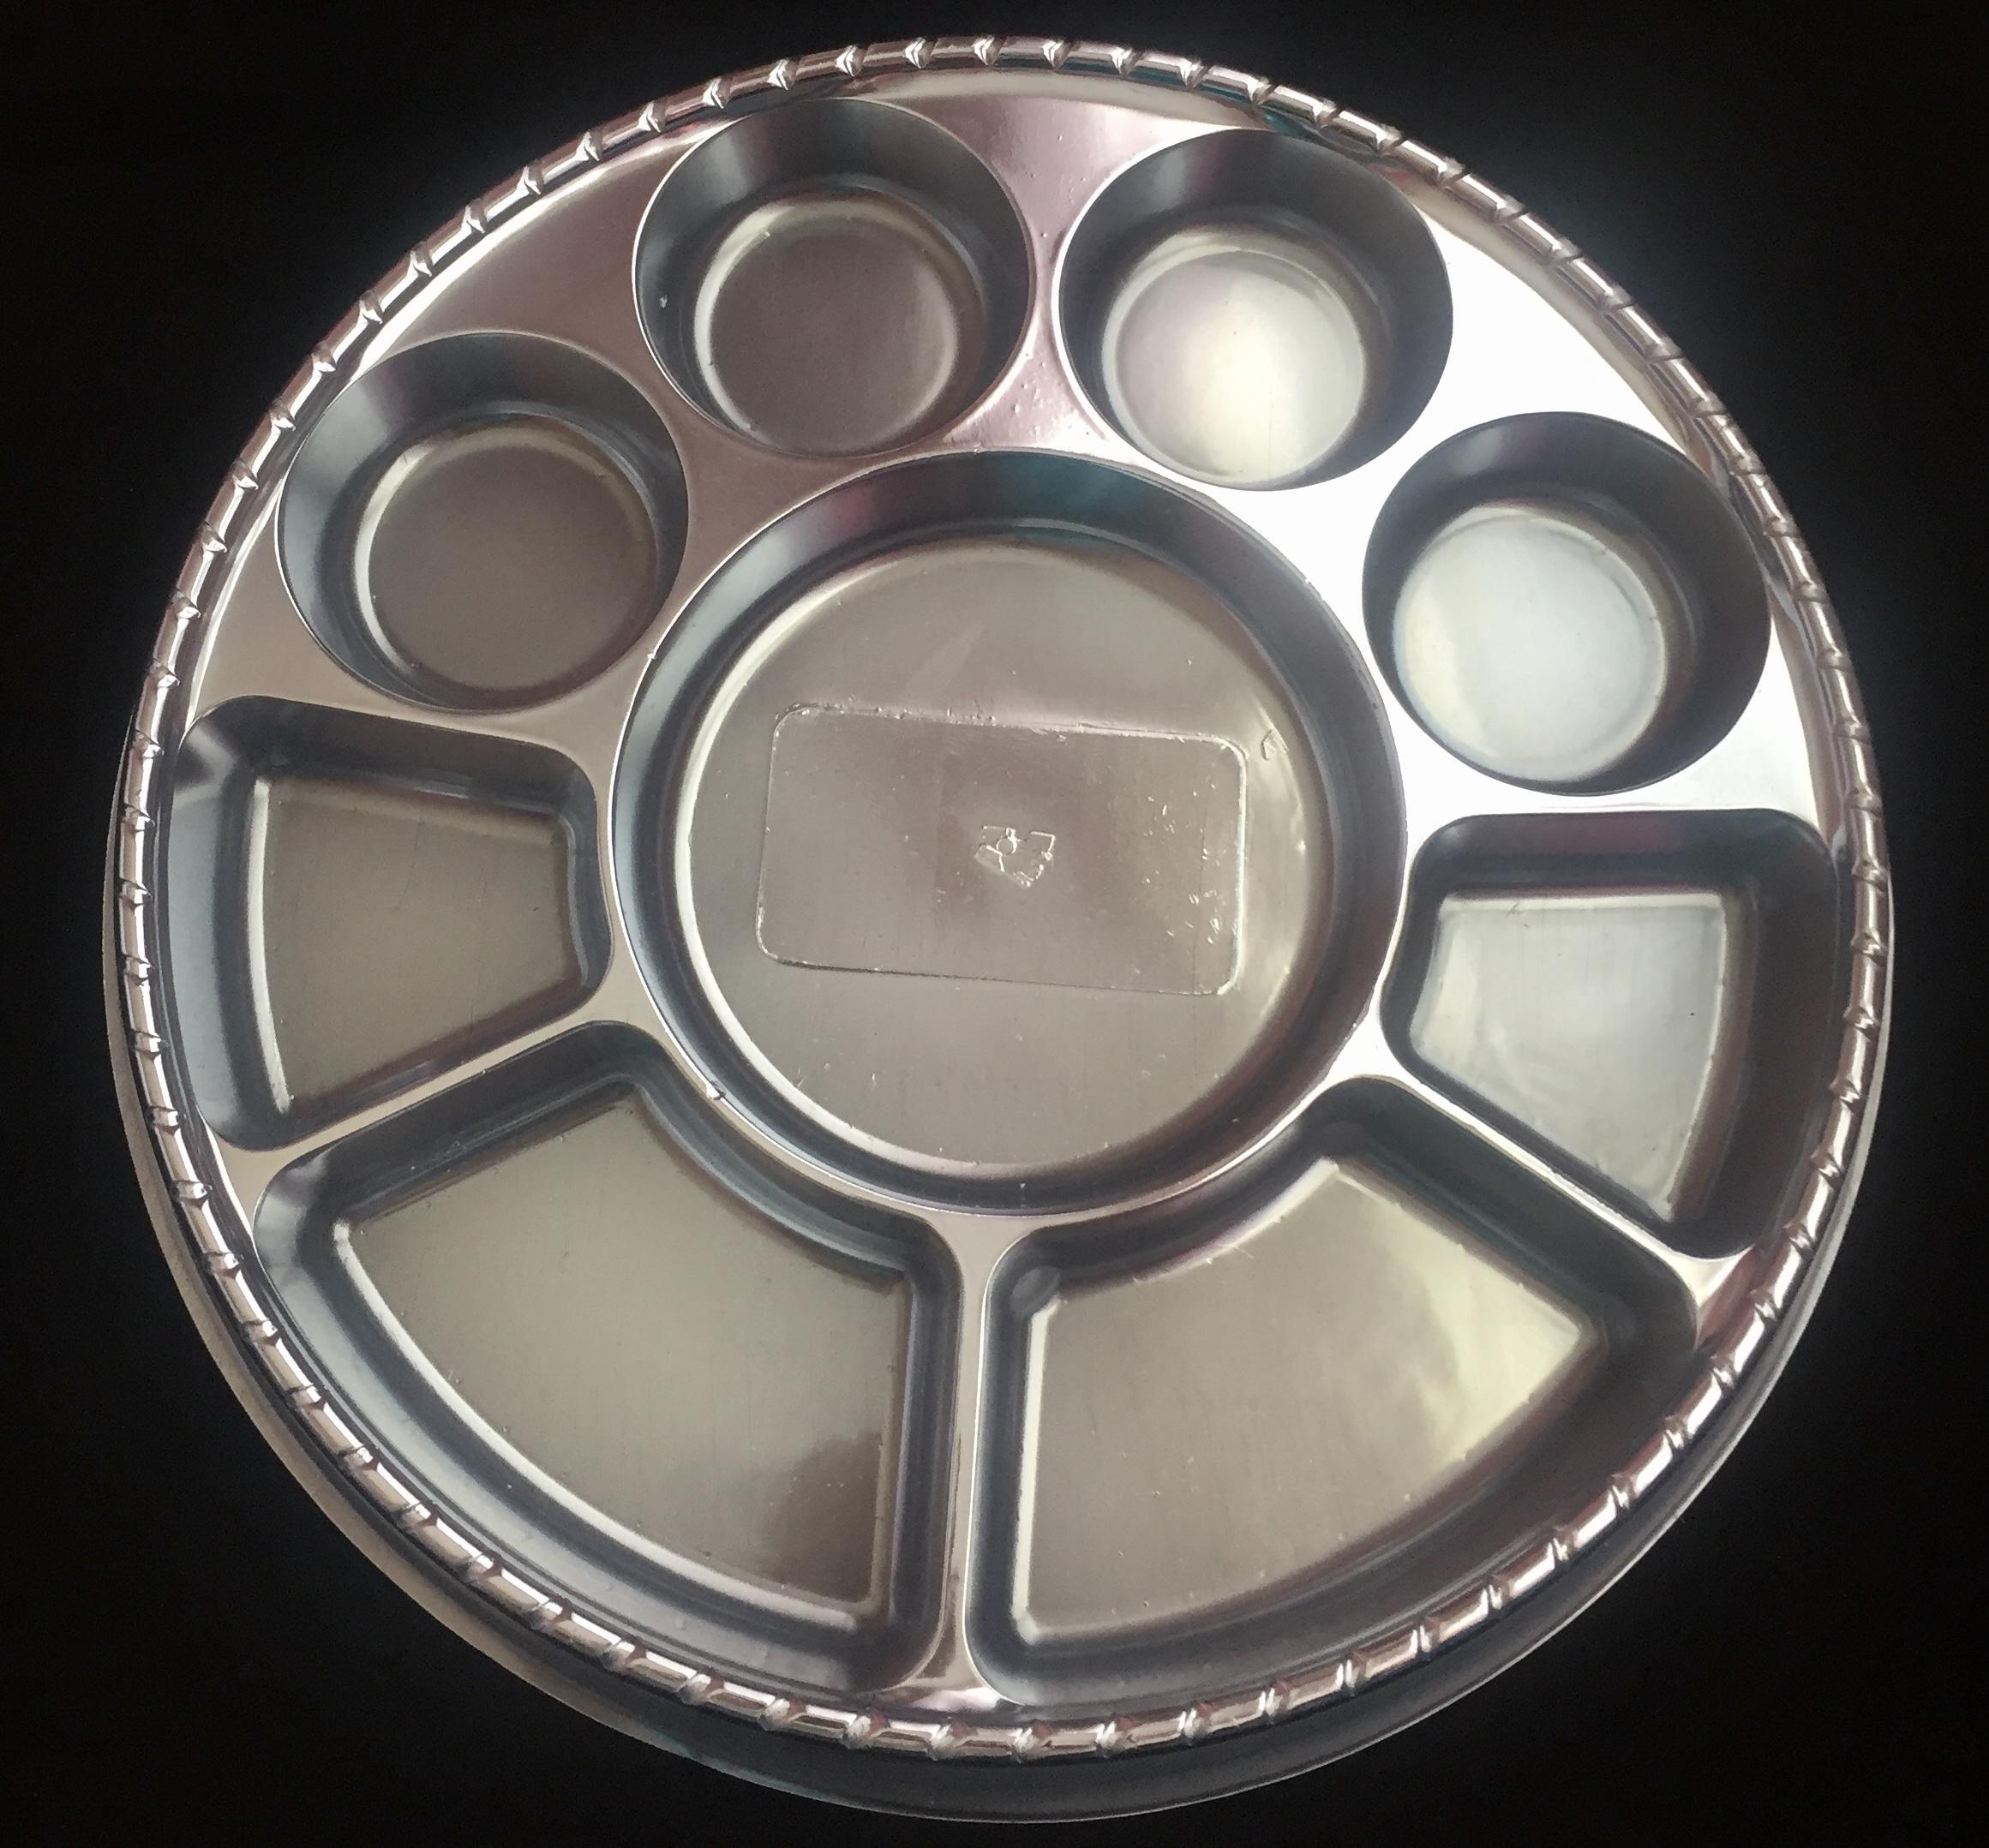 Silver Color 9 Compartment Plates